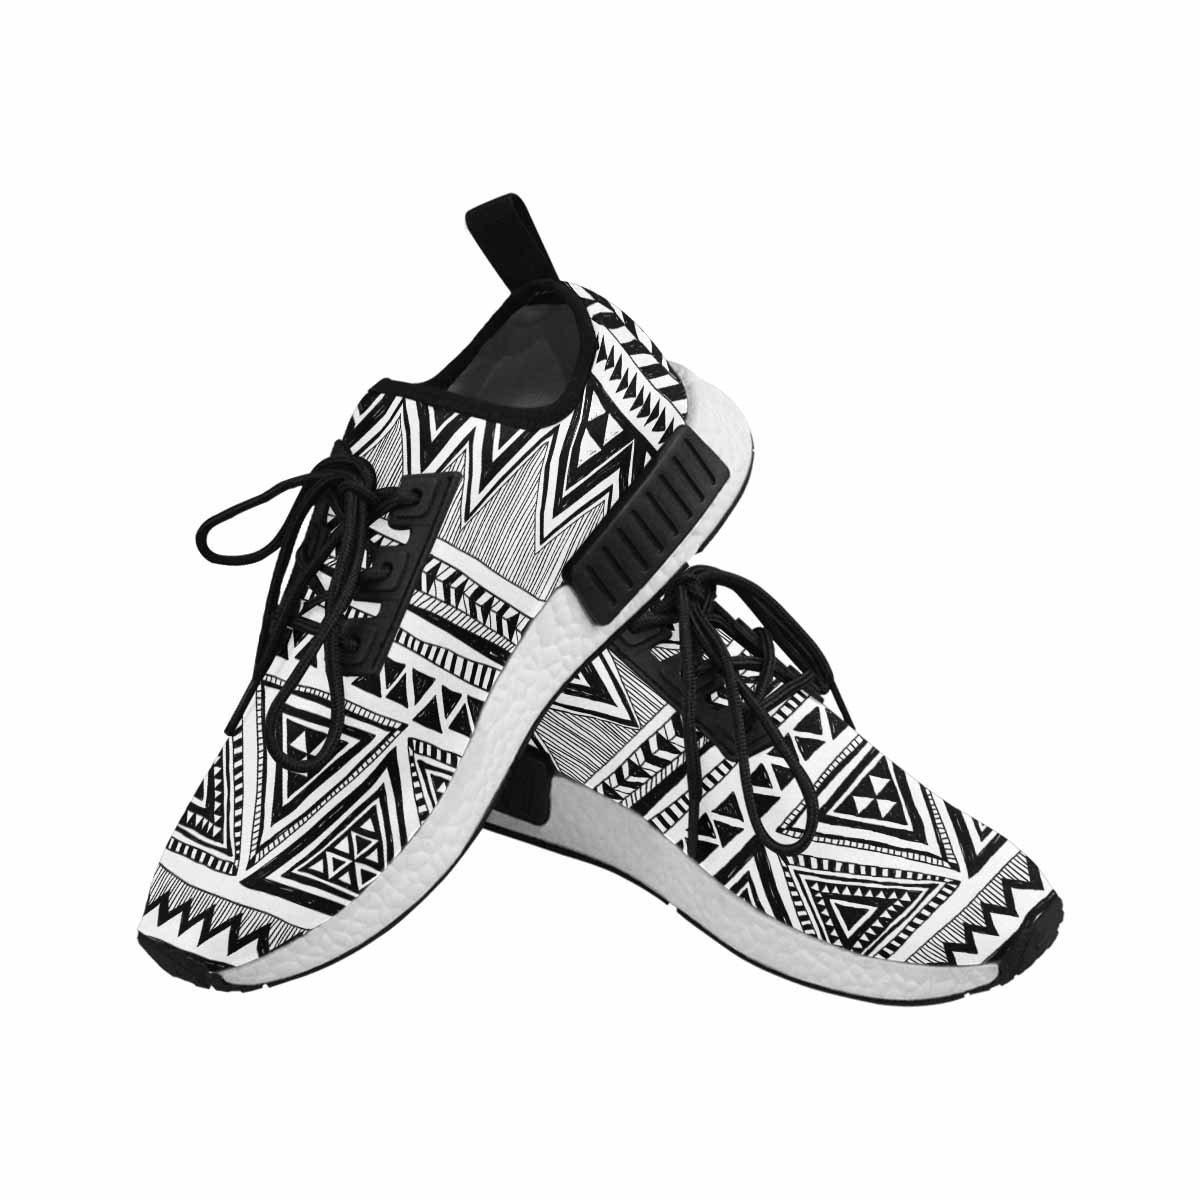 InterestPrint Women's Draco Running Comfort Sports Athletic Shoes Cassette Laptop Case 6 B(M) US